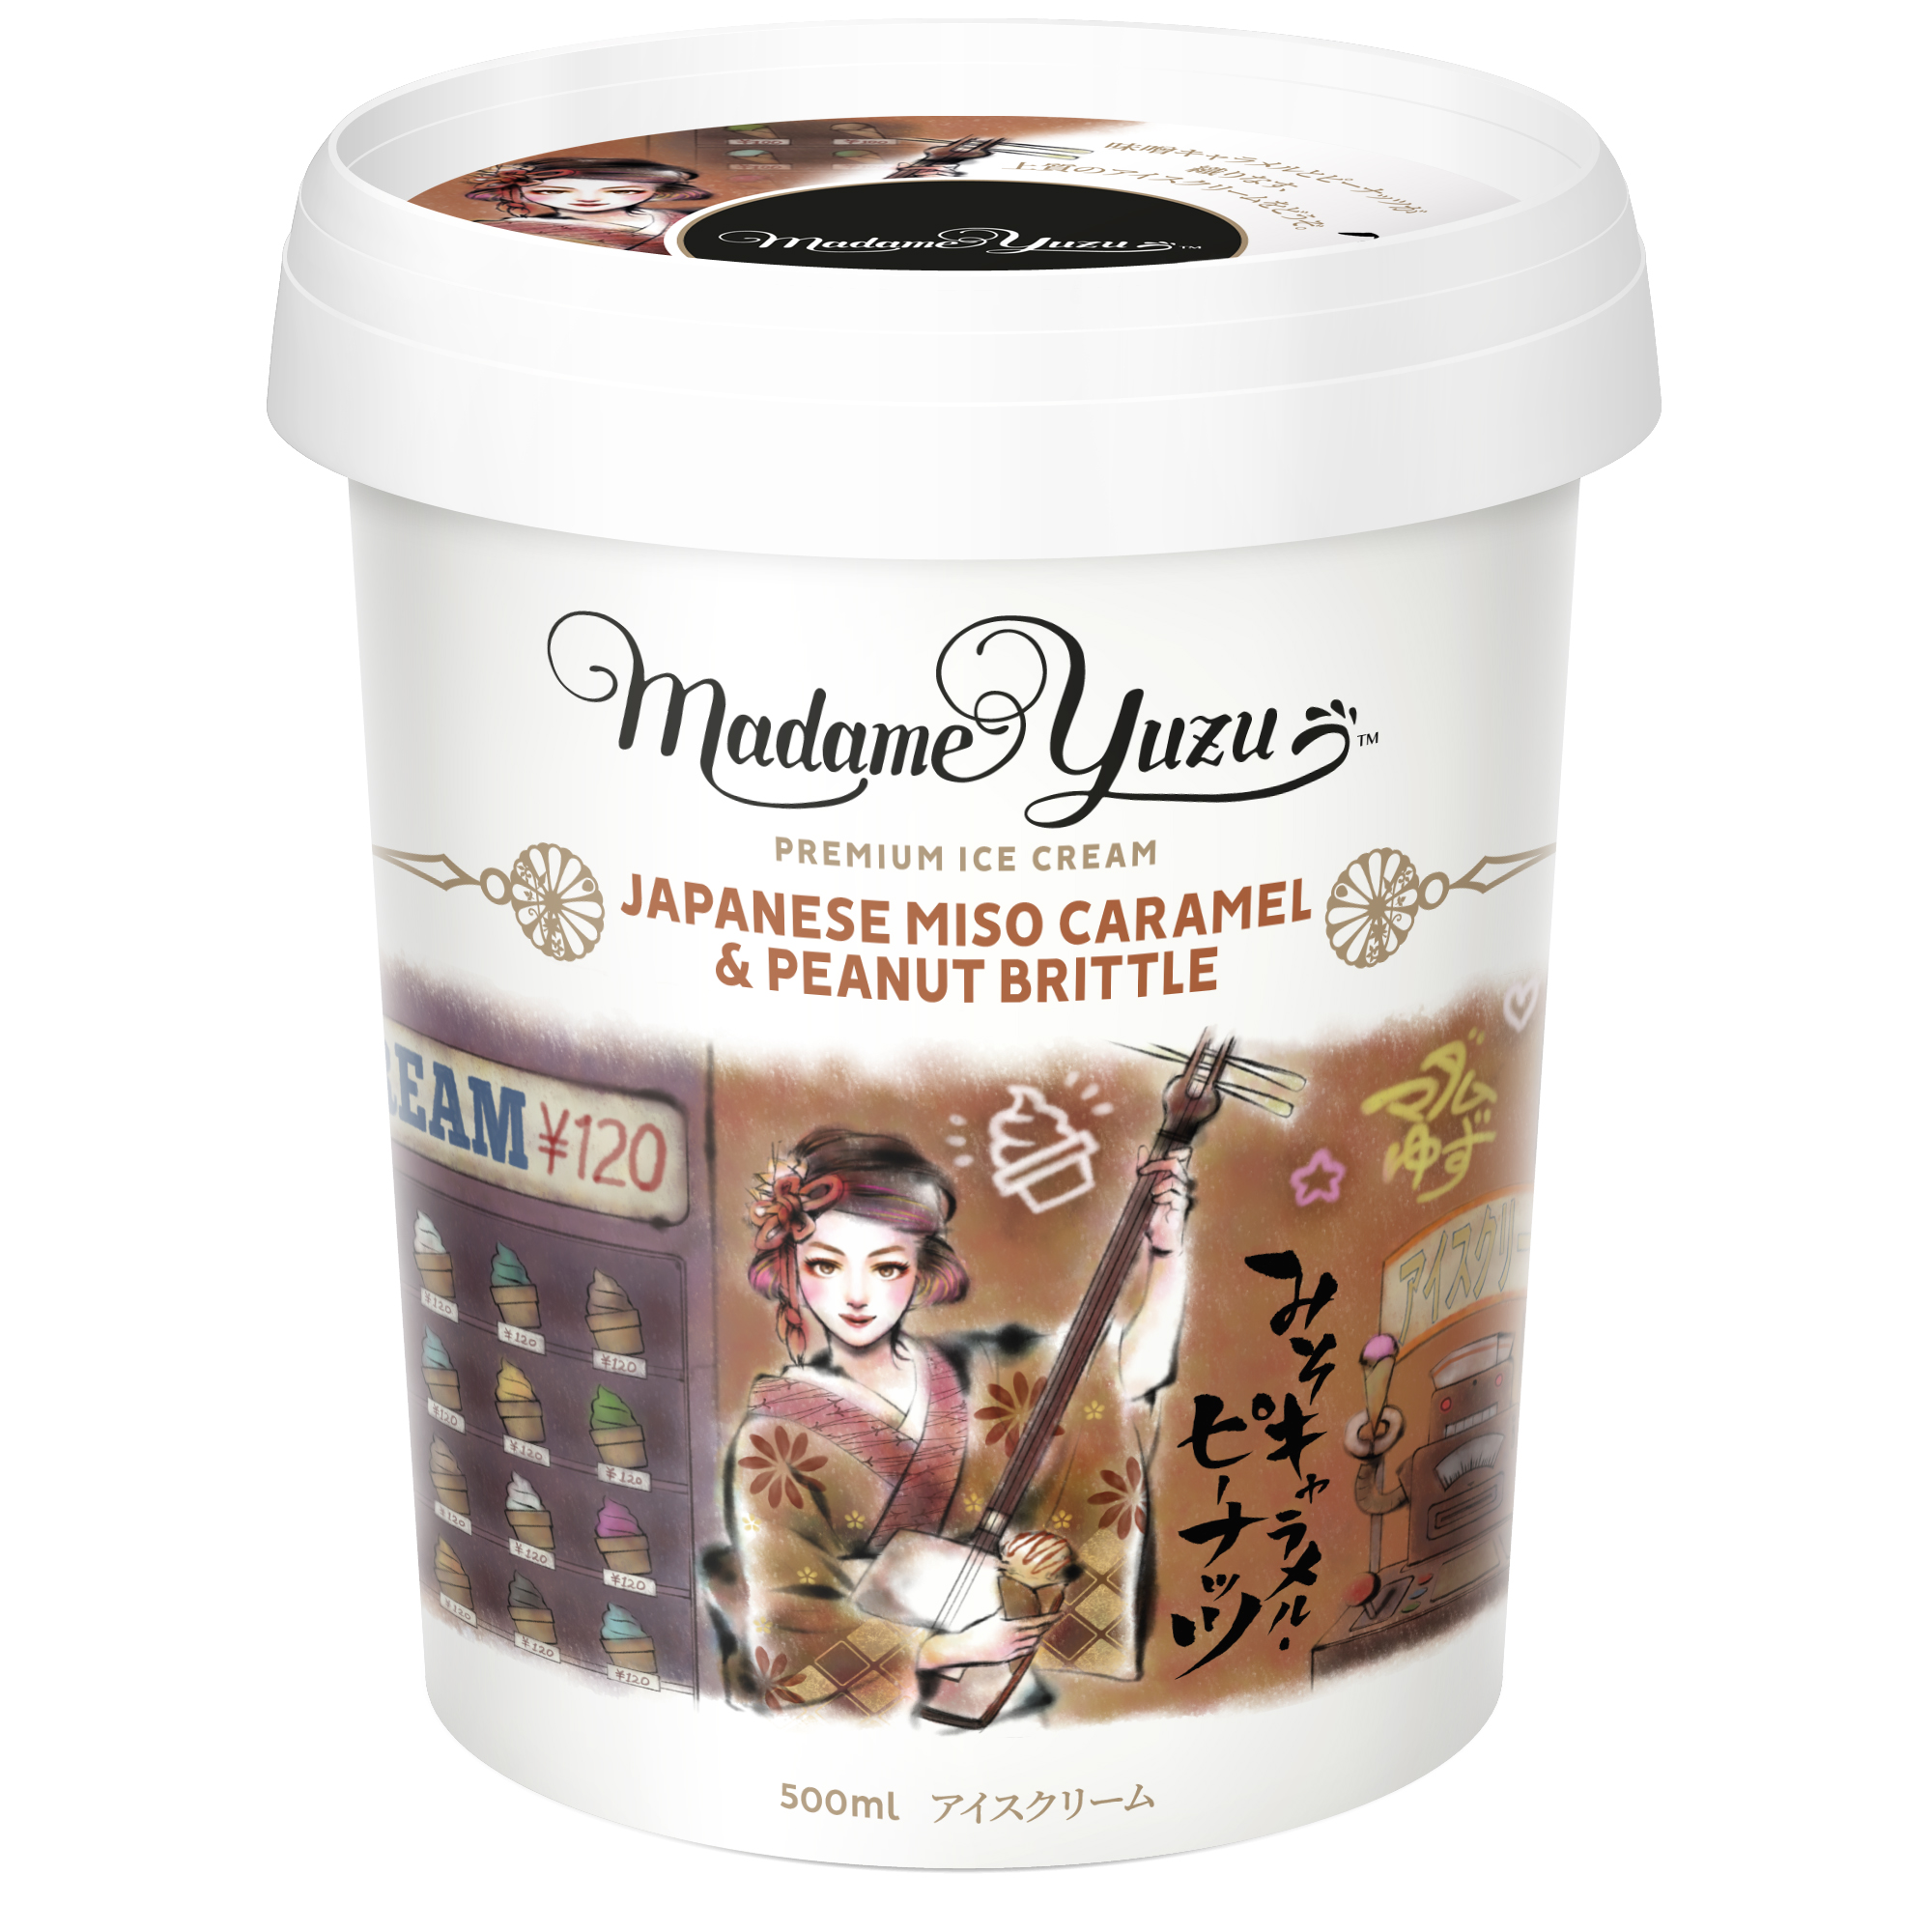 Japanese Miso Caramel & Peanut Brittle